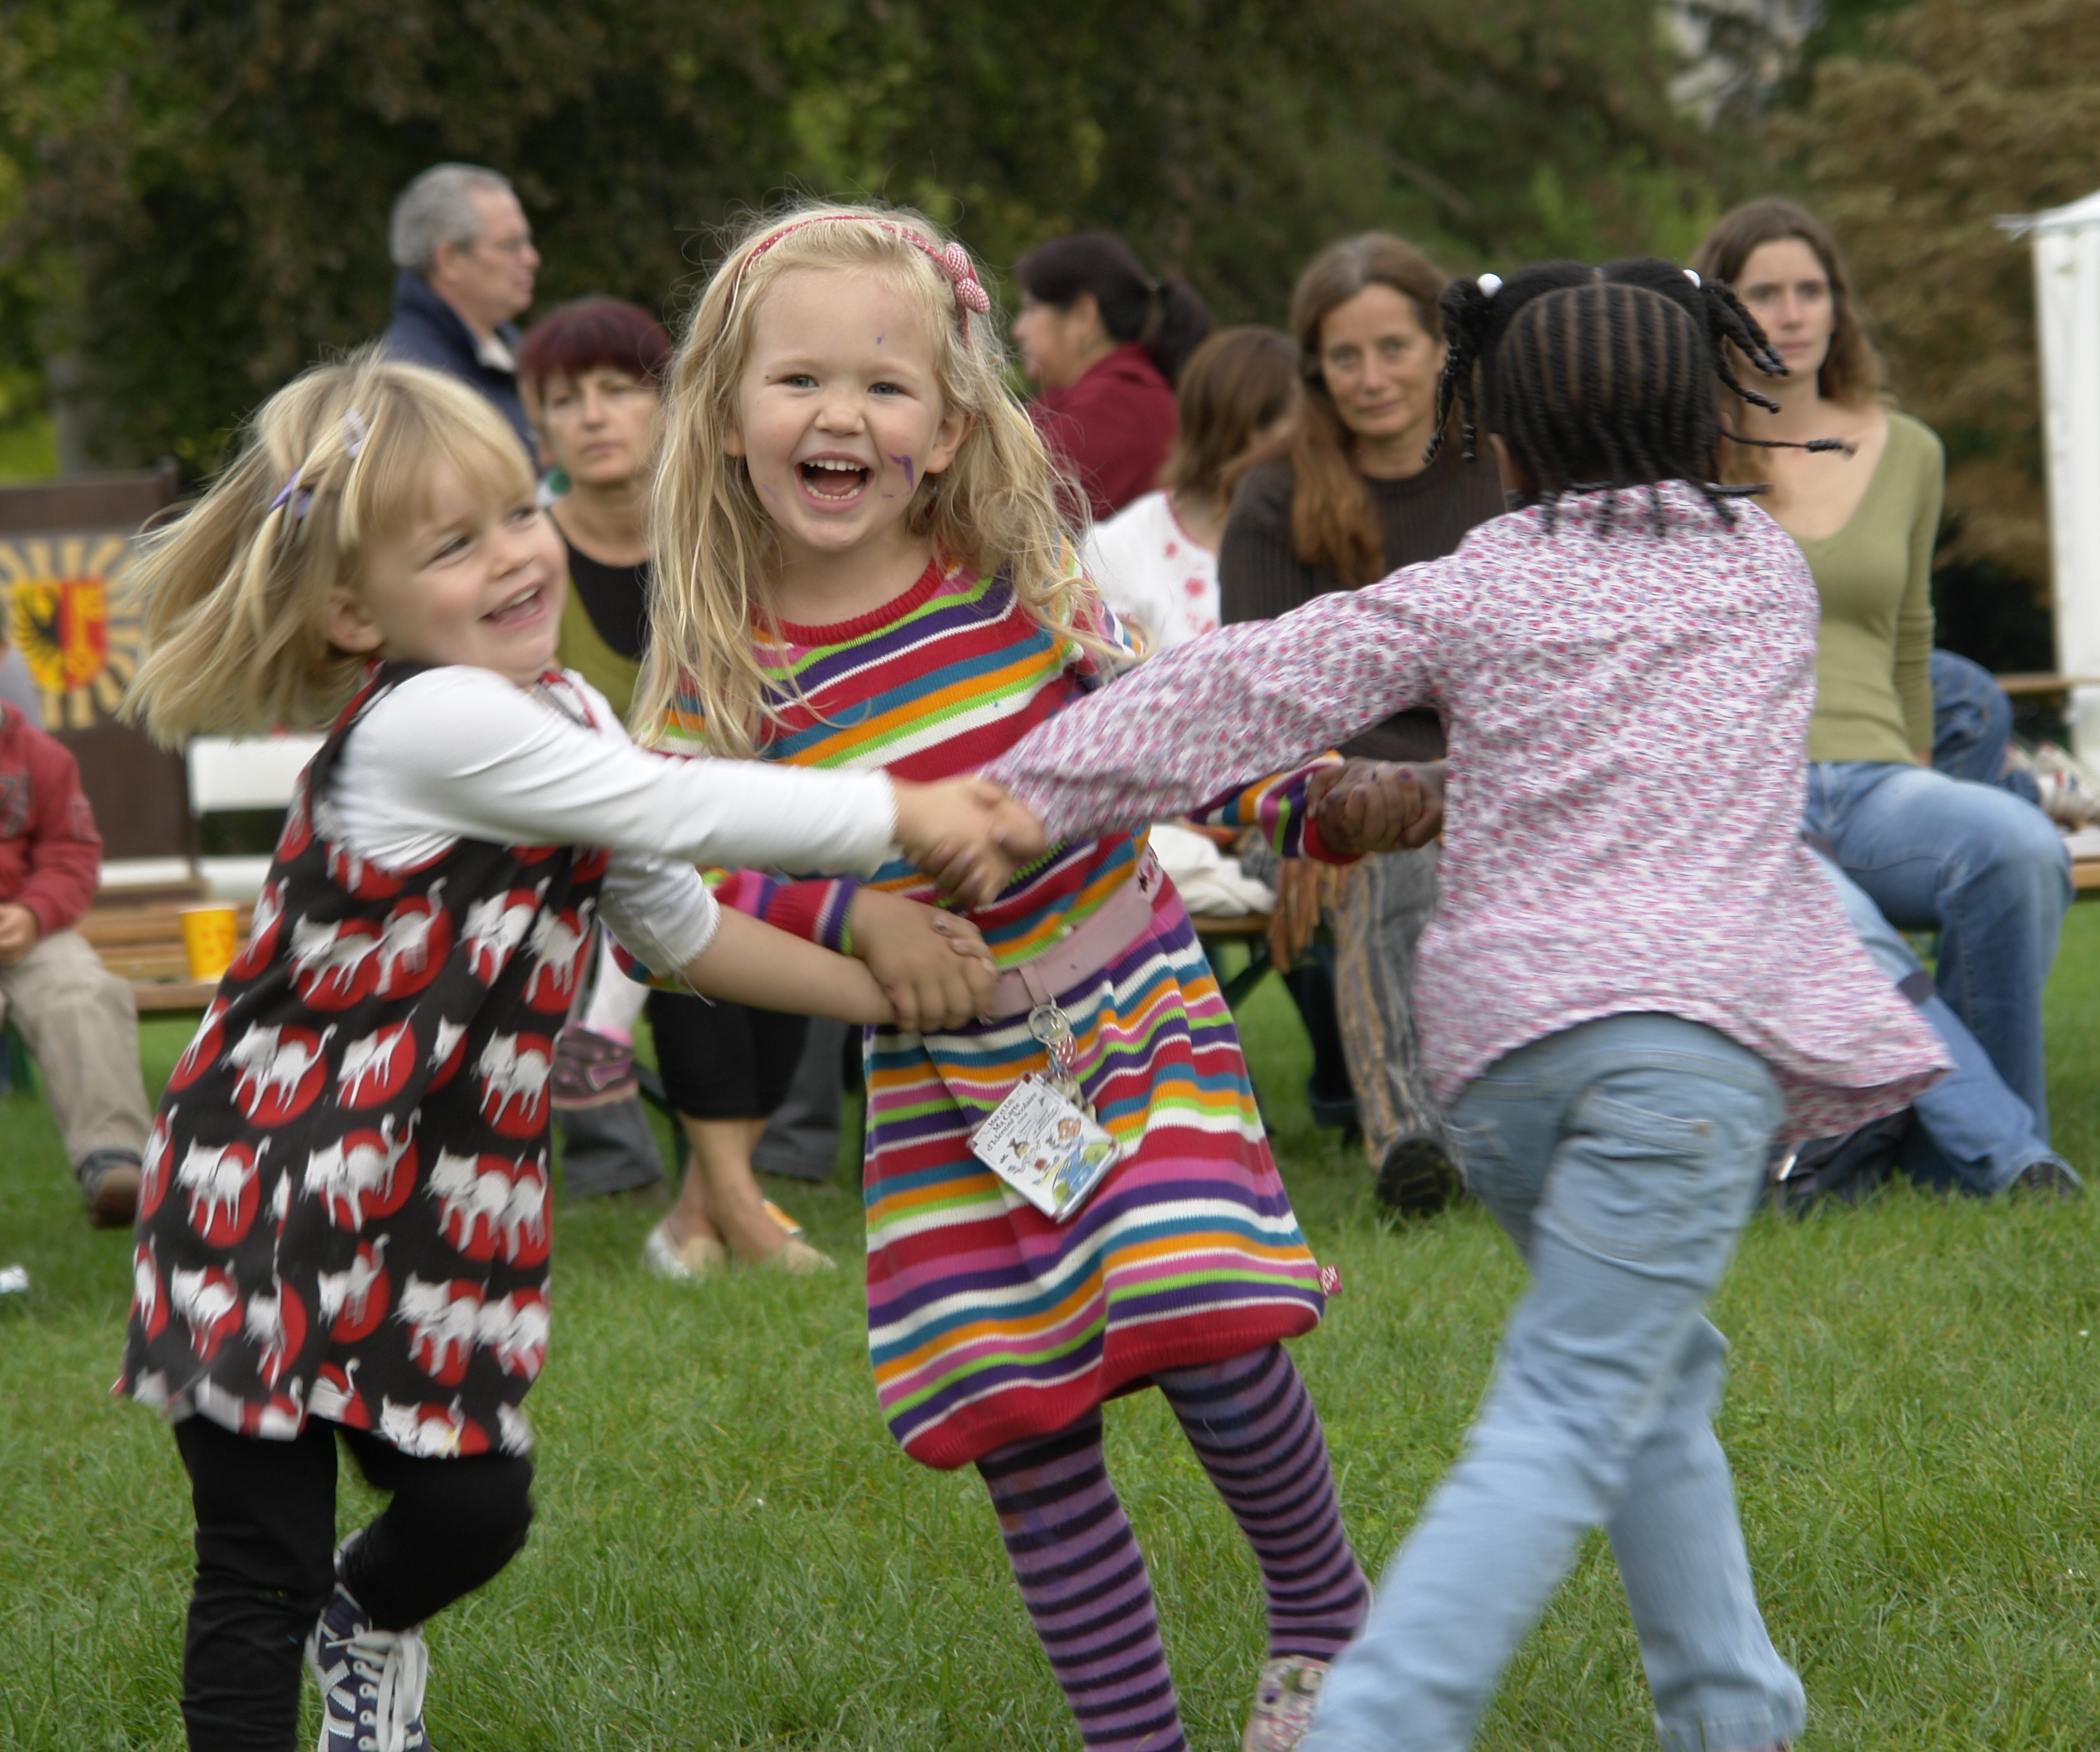 Children dancing in a circle